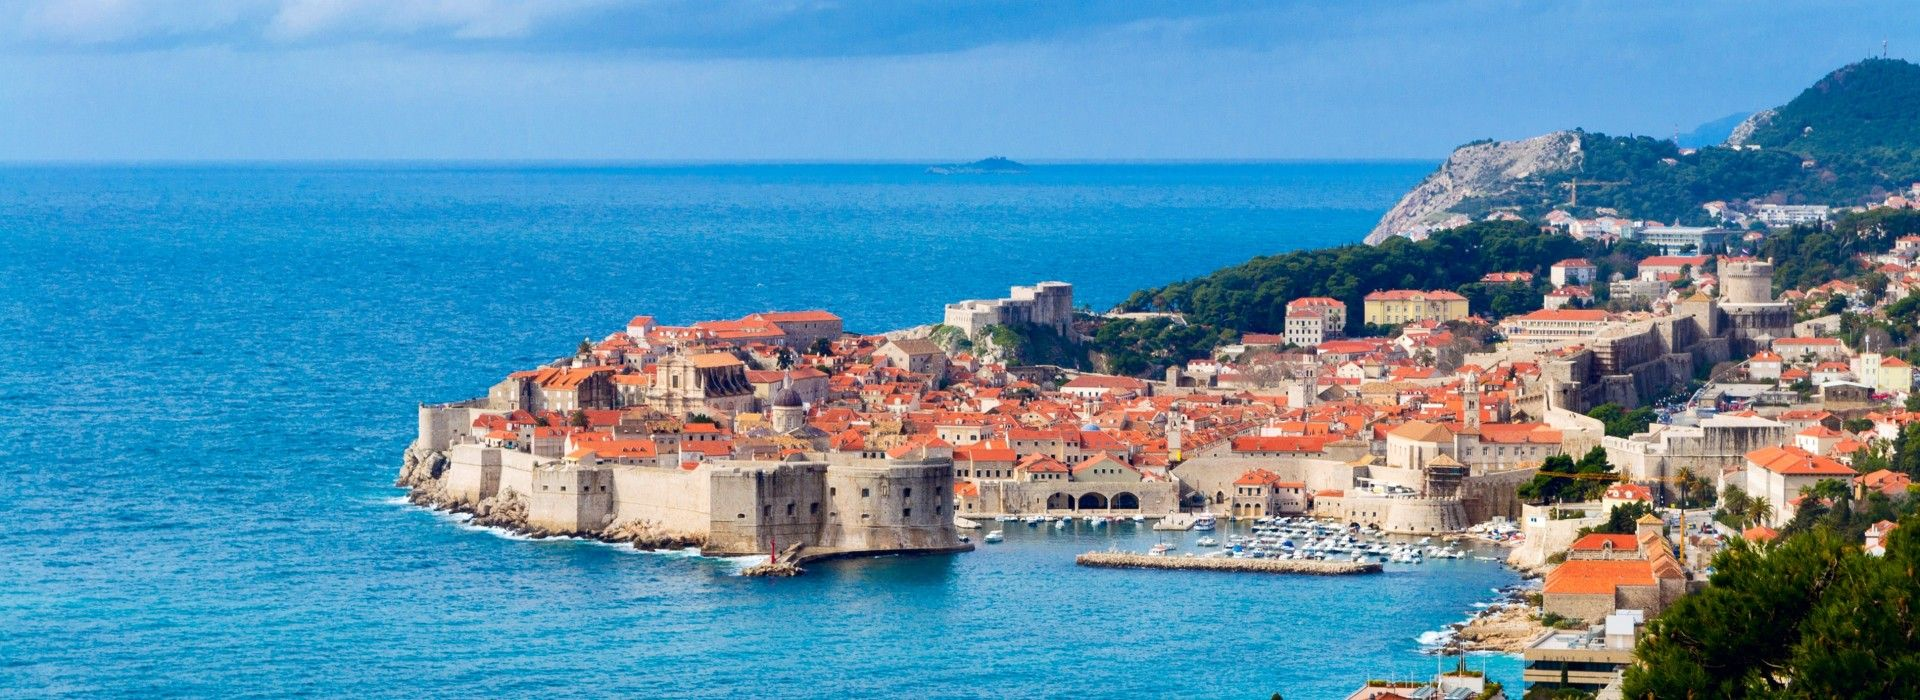 Sightseeing Tours in Croatia